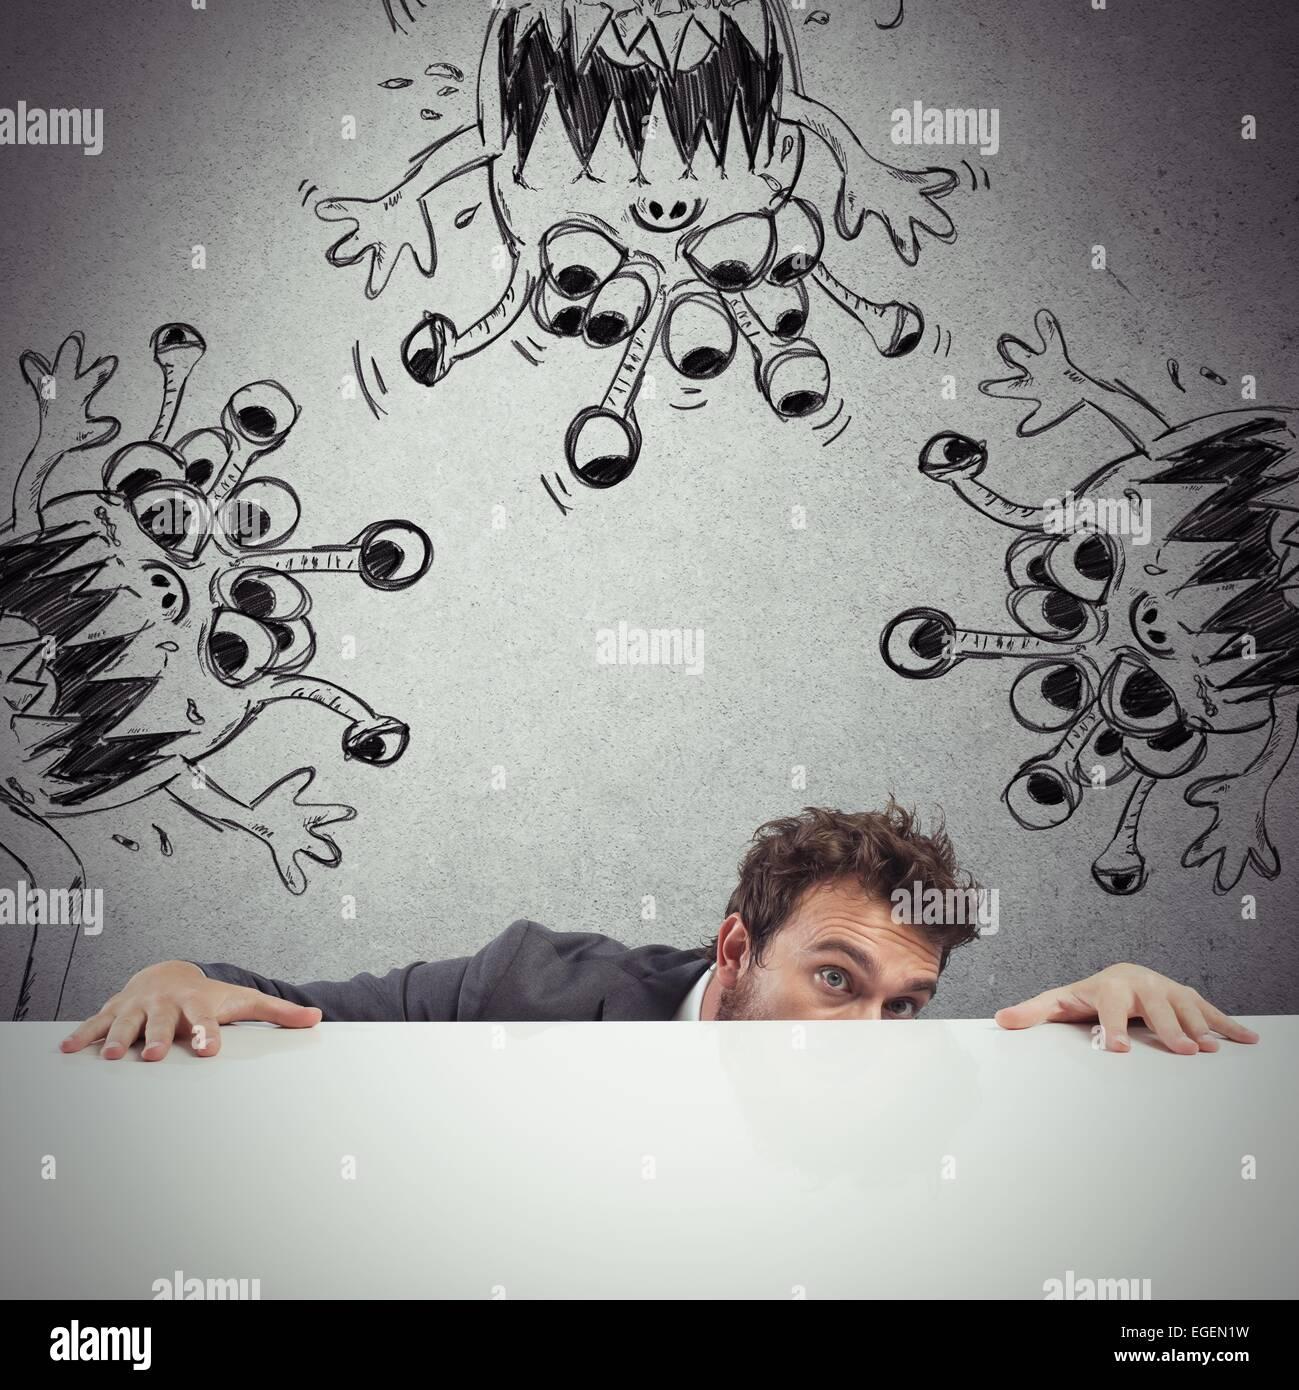 Uomo nasconde virus Immagini Stock